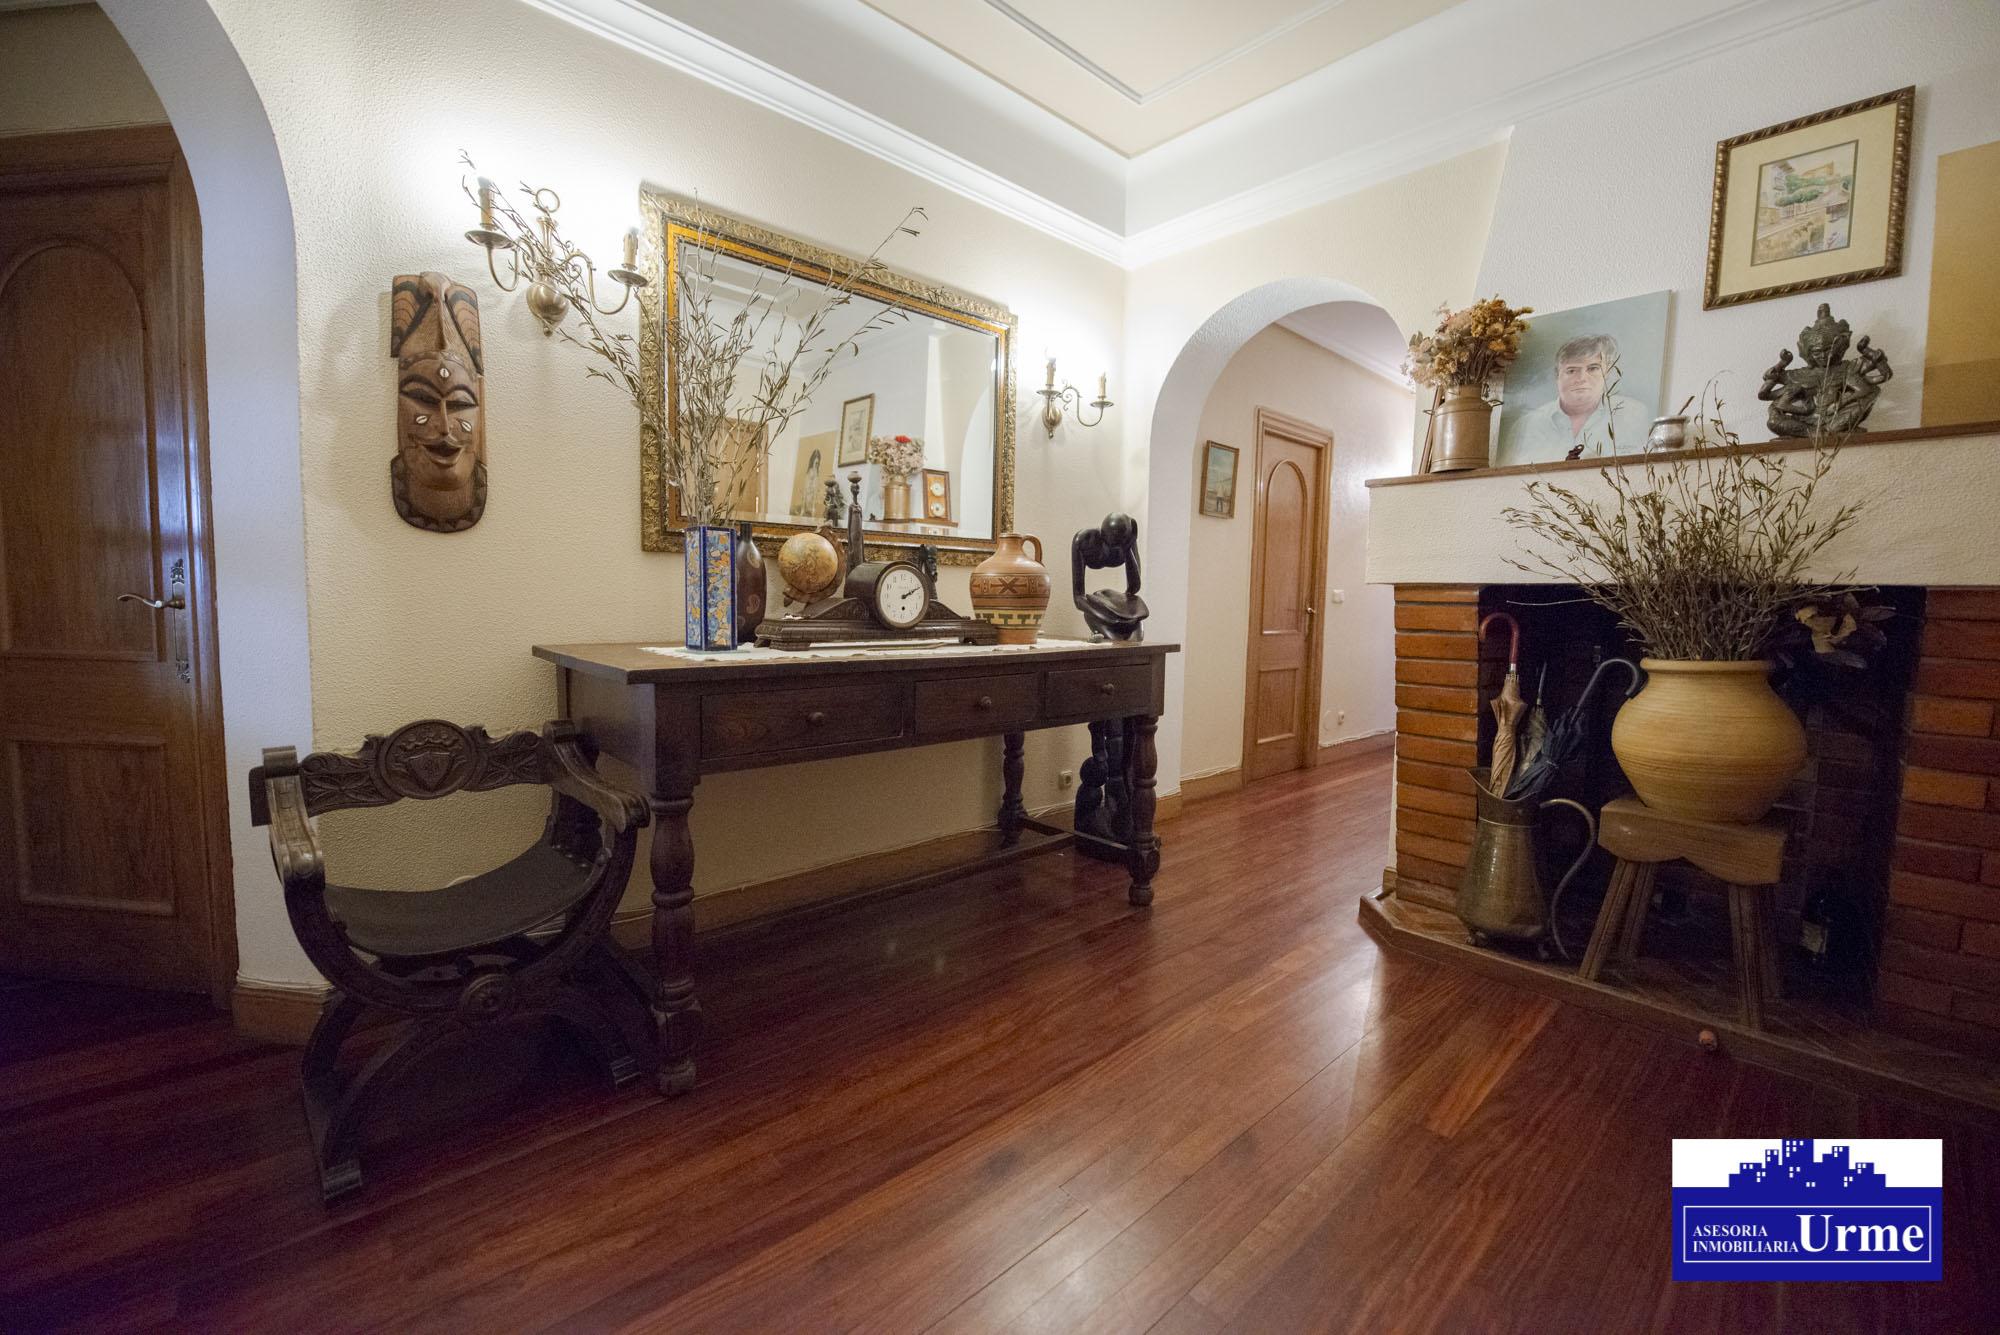 Piso alto en Paseo de Colon, en esquina,exterior,177m2, 5 dormitorios, salon,cocina-comedor, dos baños!!! Posibilidad de segregar.Informate!!